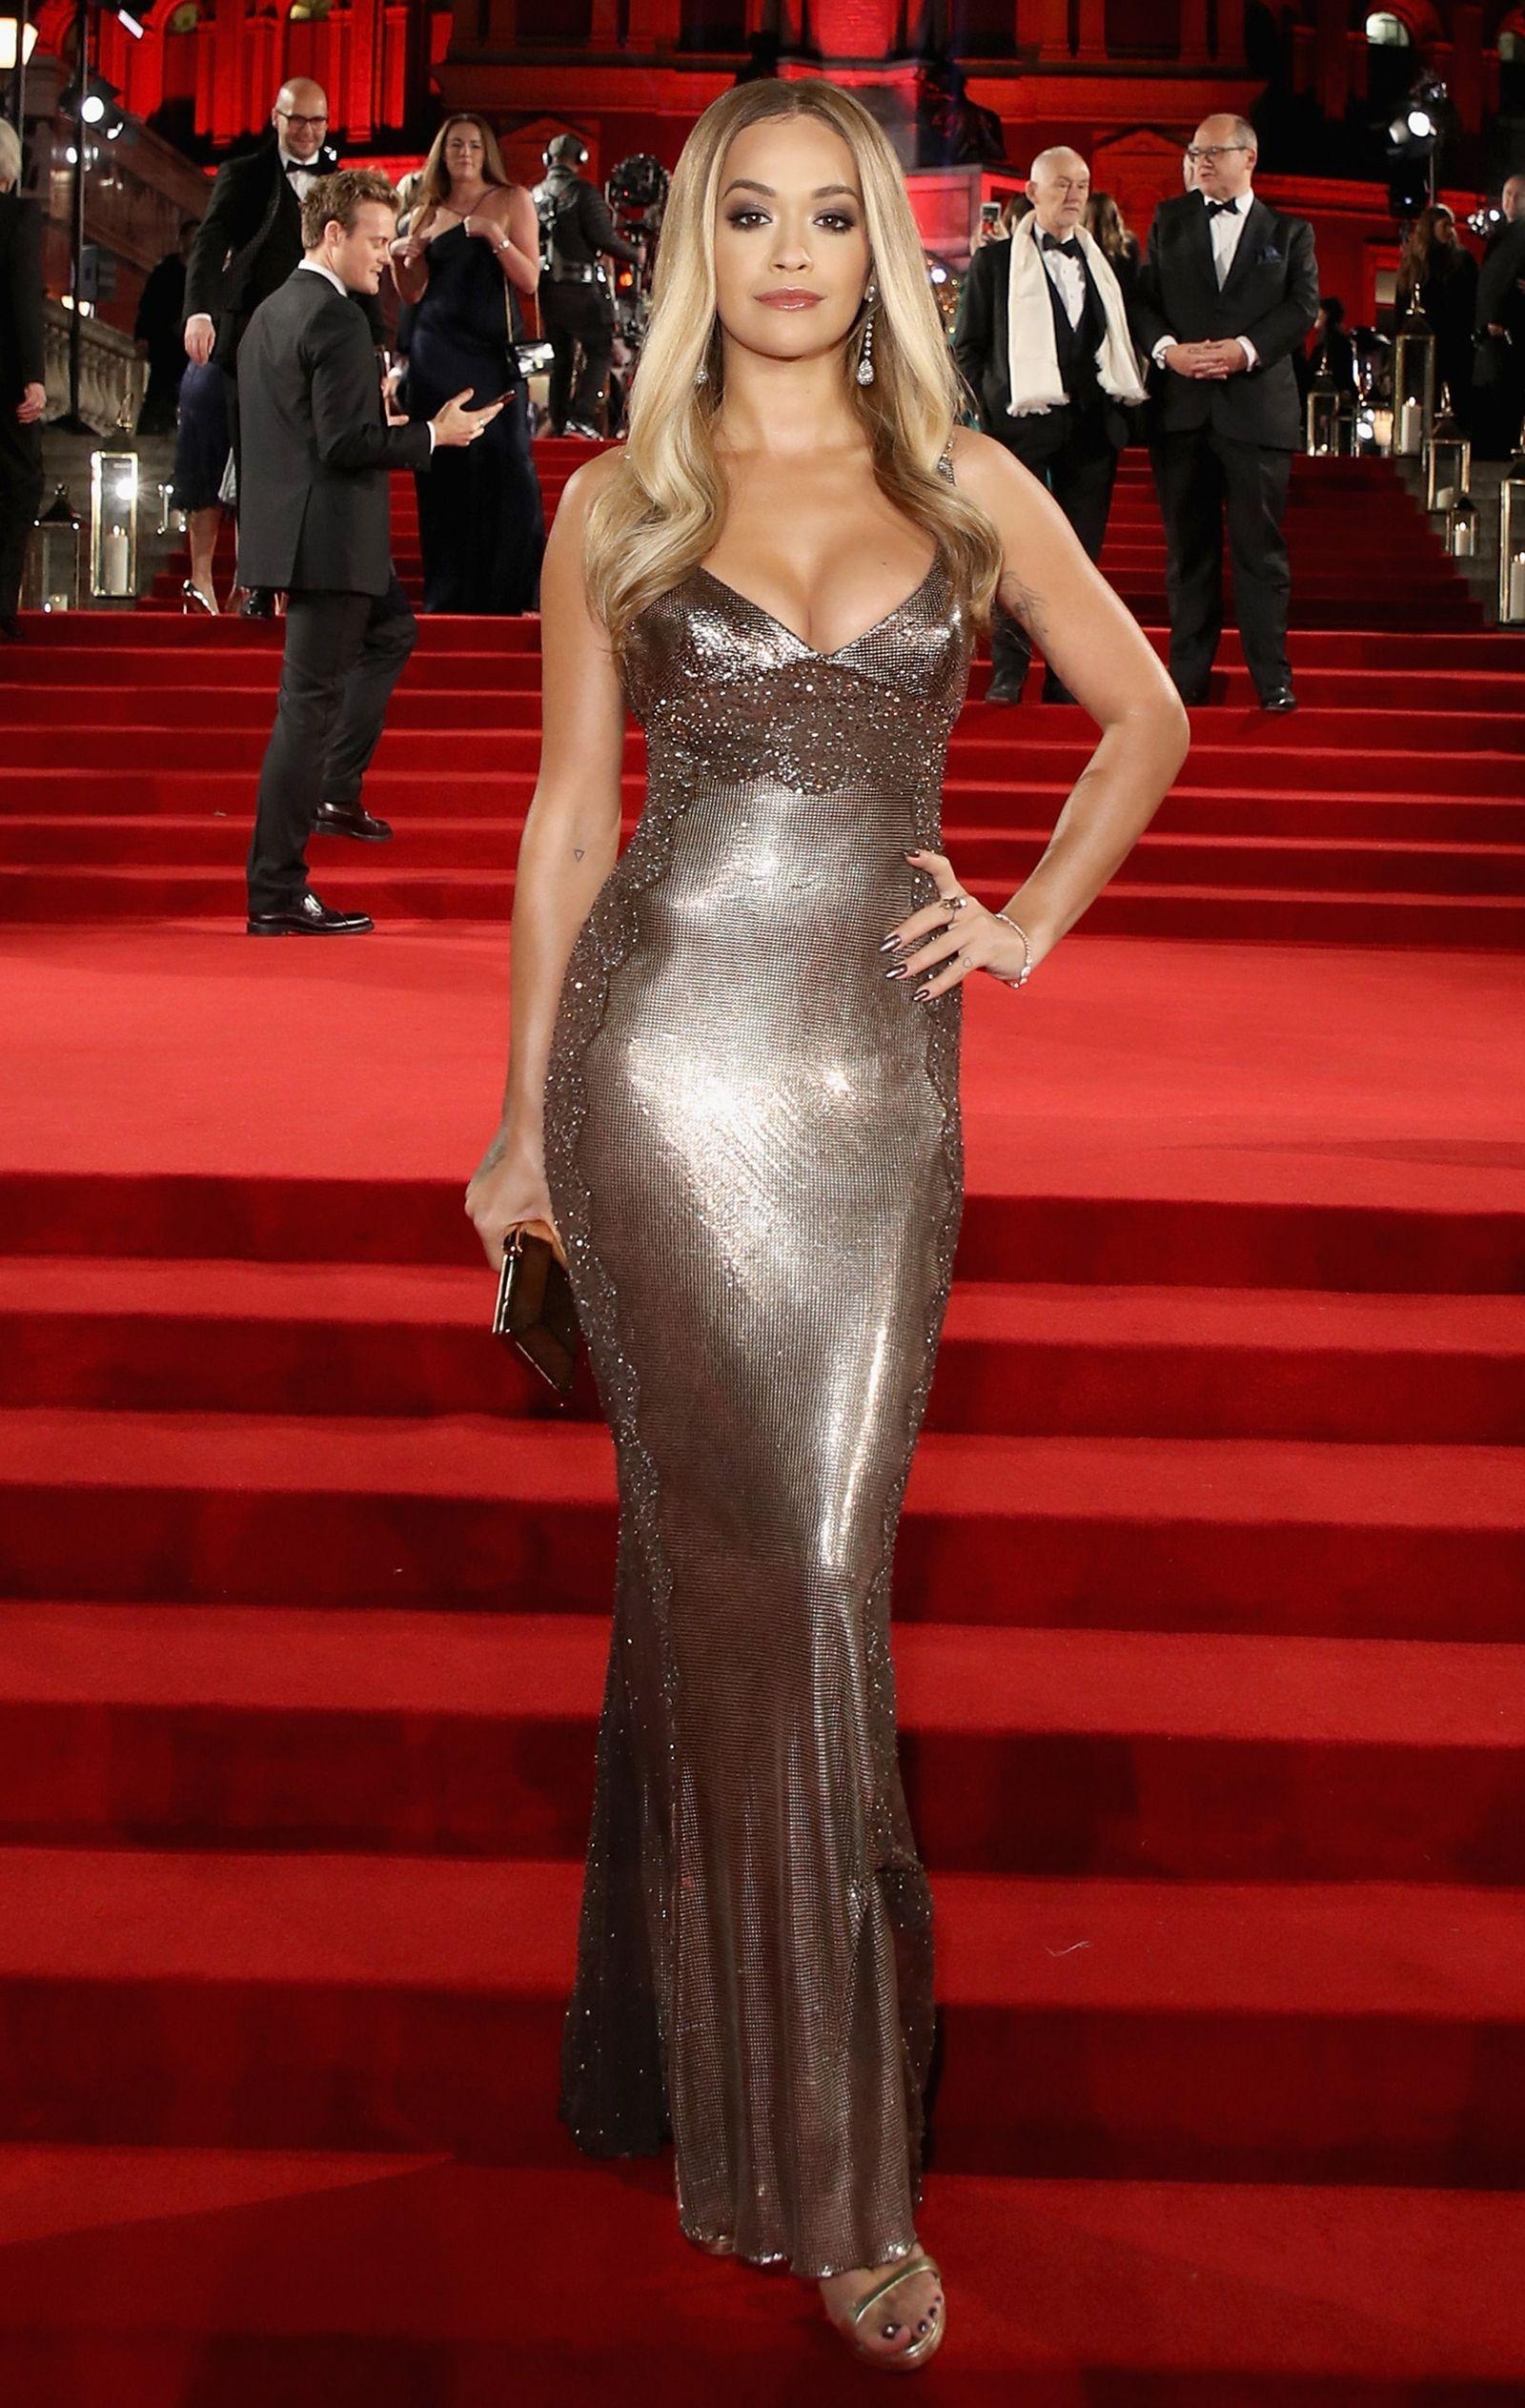 661e7ad9f7a5 Rita Ora turns heads in figure hugging metallic dress   Celebrities ...